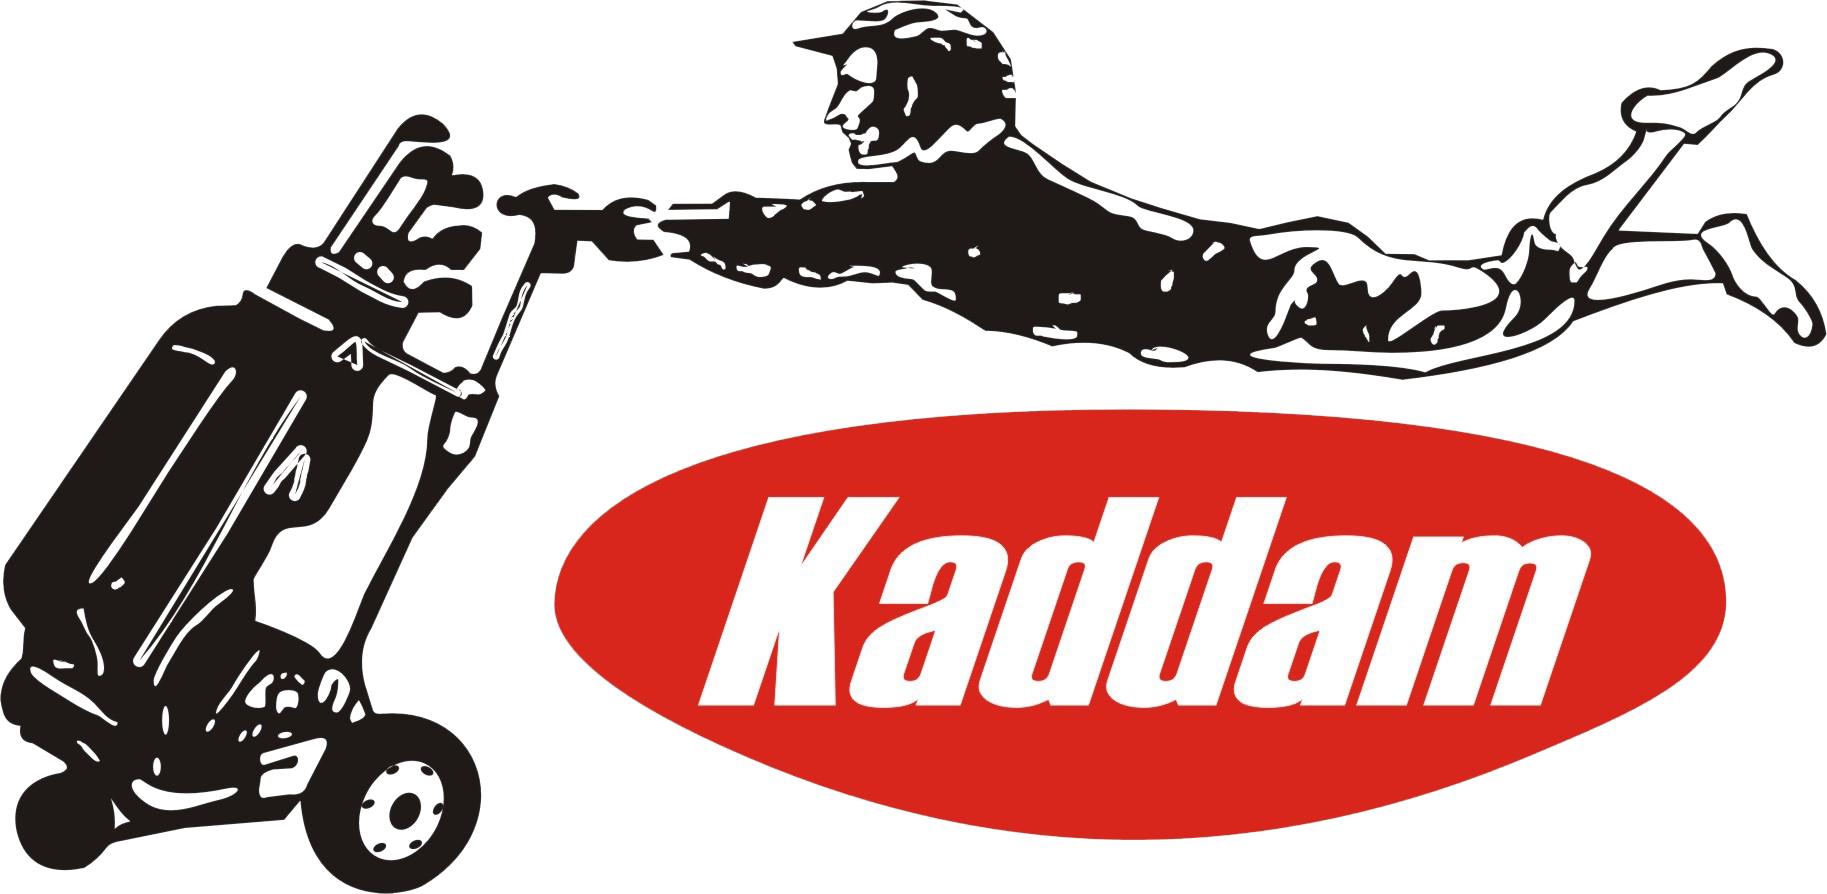 Kaddam